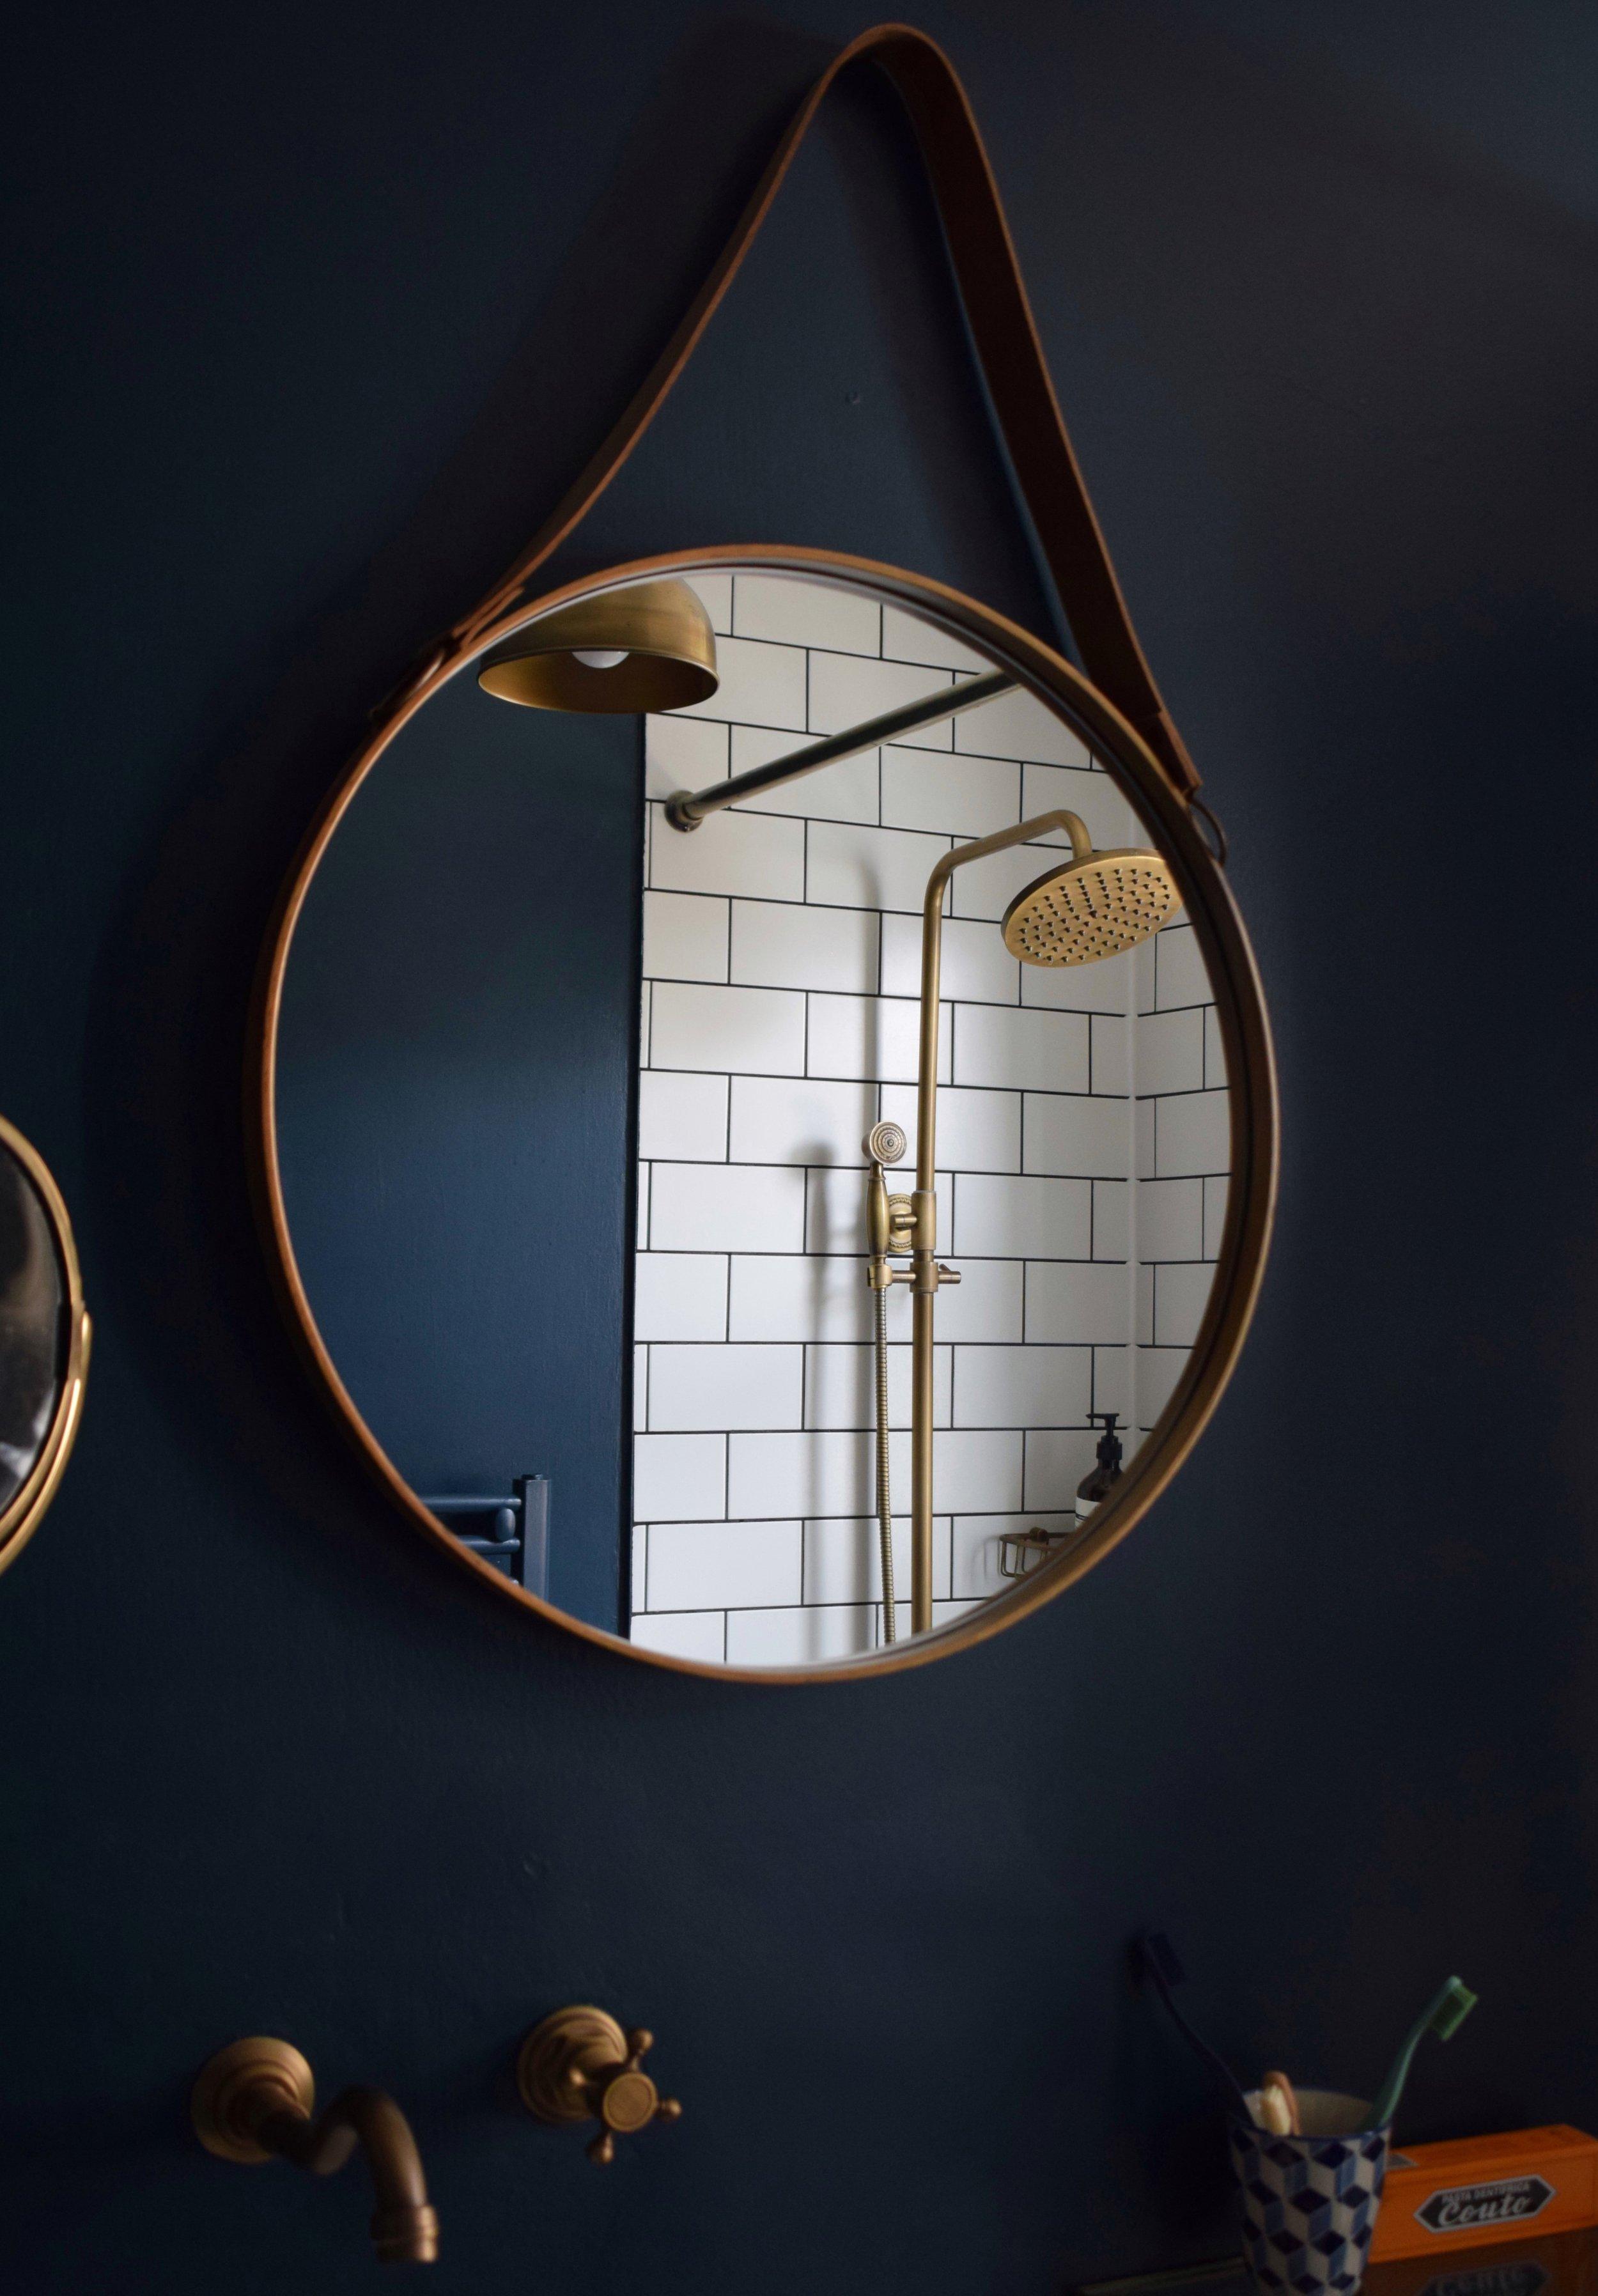 Hague blue metro tiles brass fittings bathroom copy.jpg